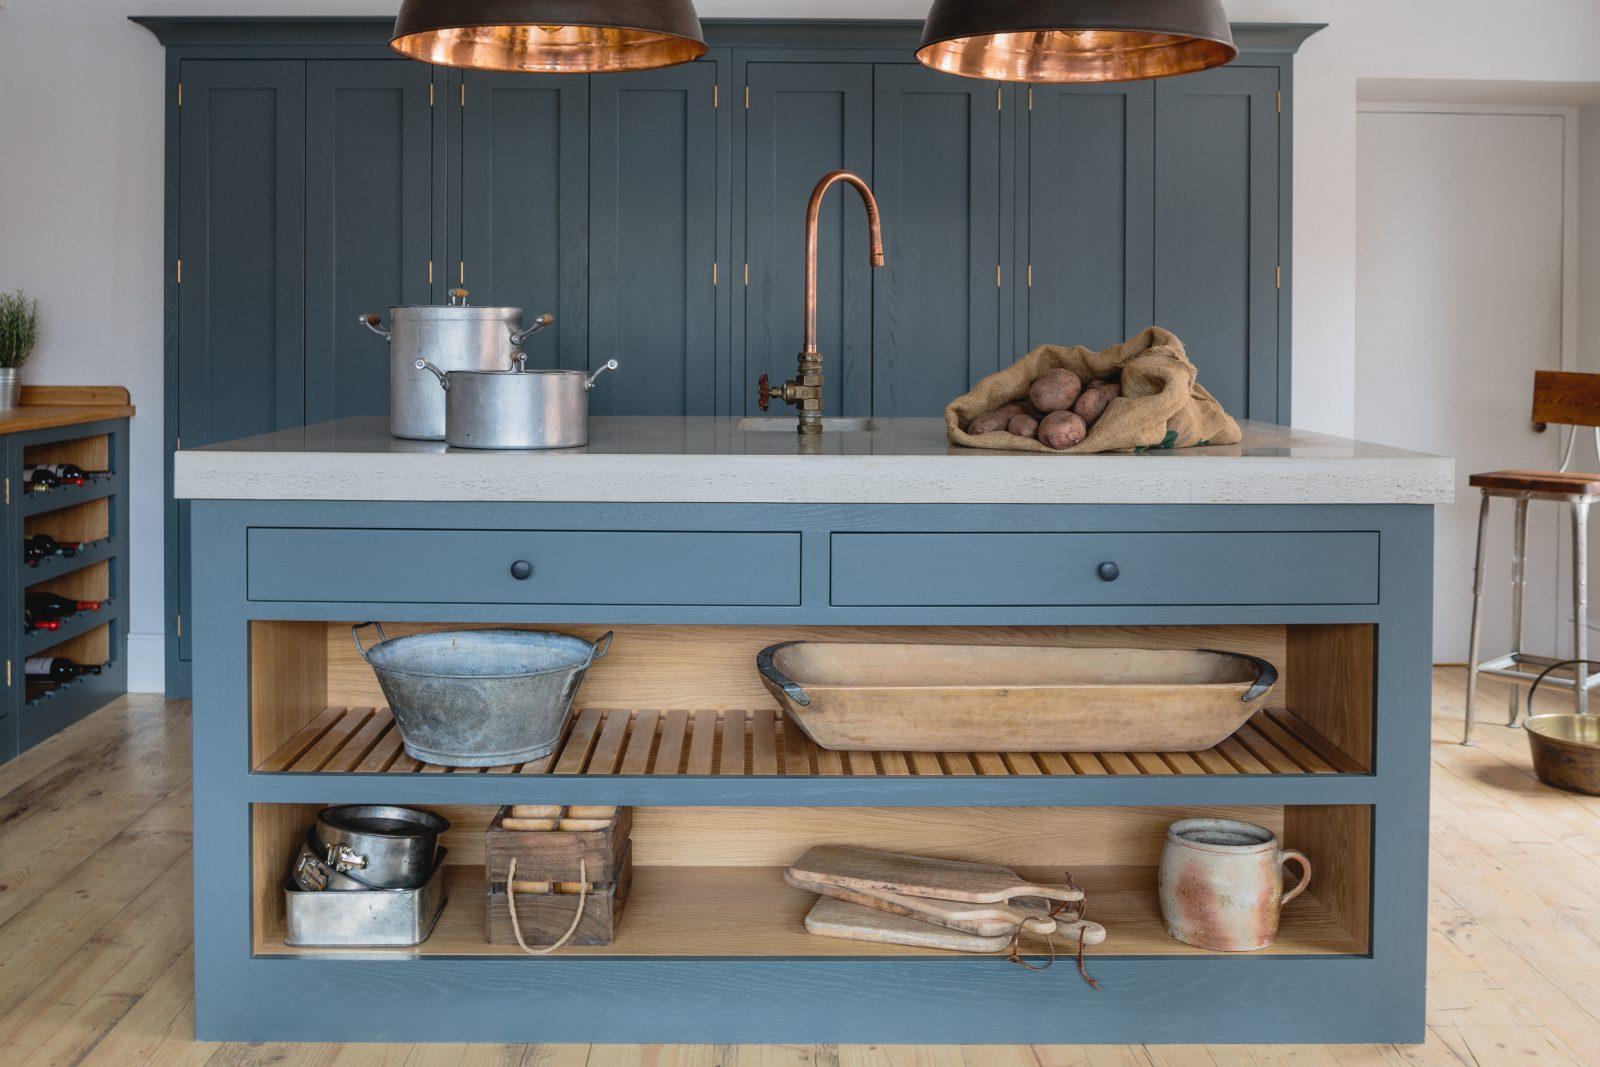 Sustainable Kitchens - Concrete Worktops - Sustainable Kitchens